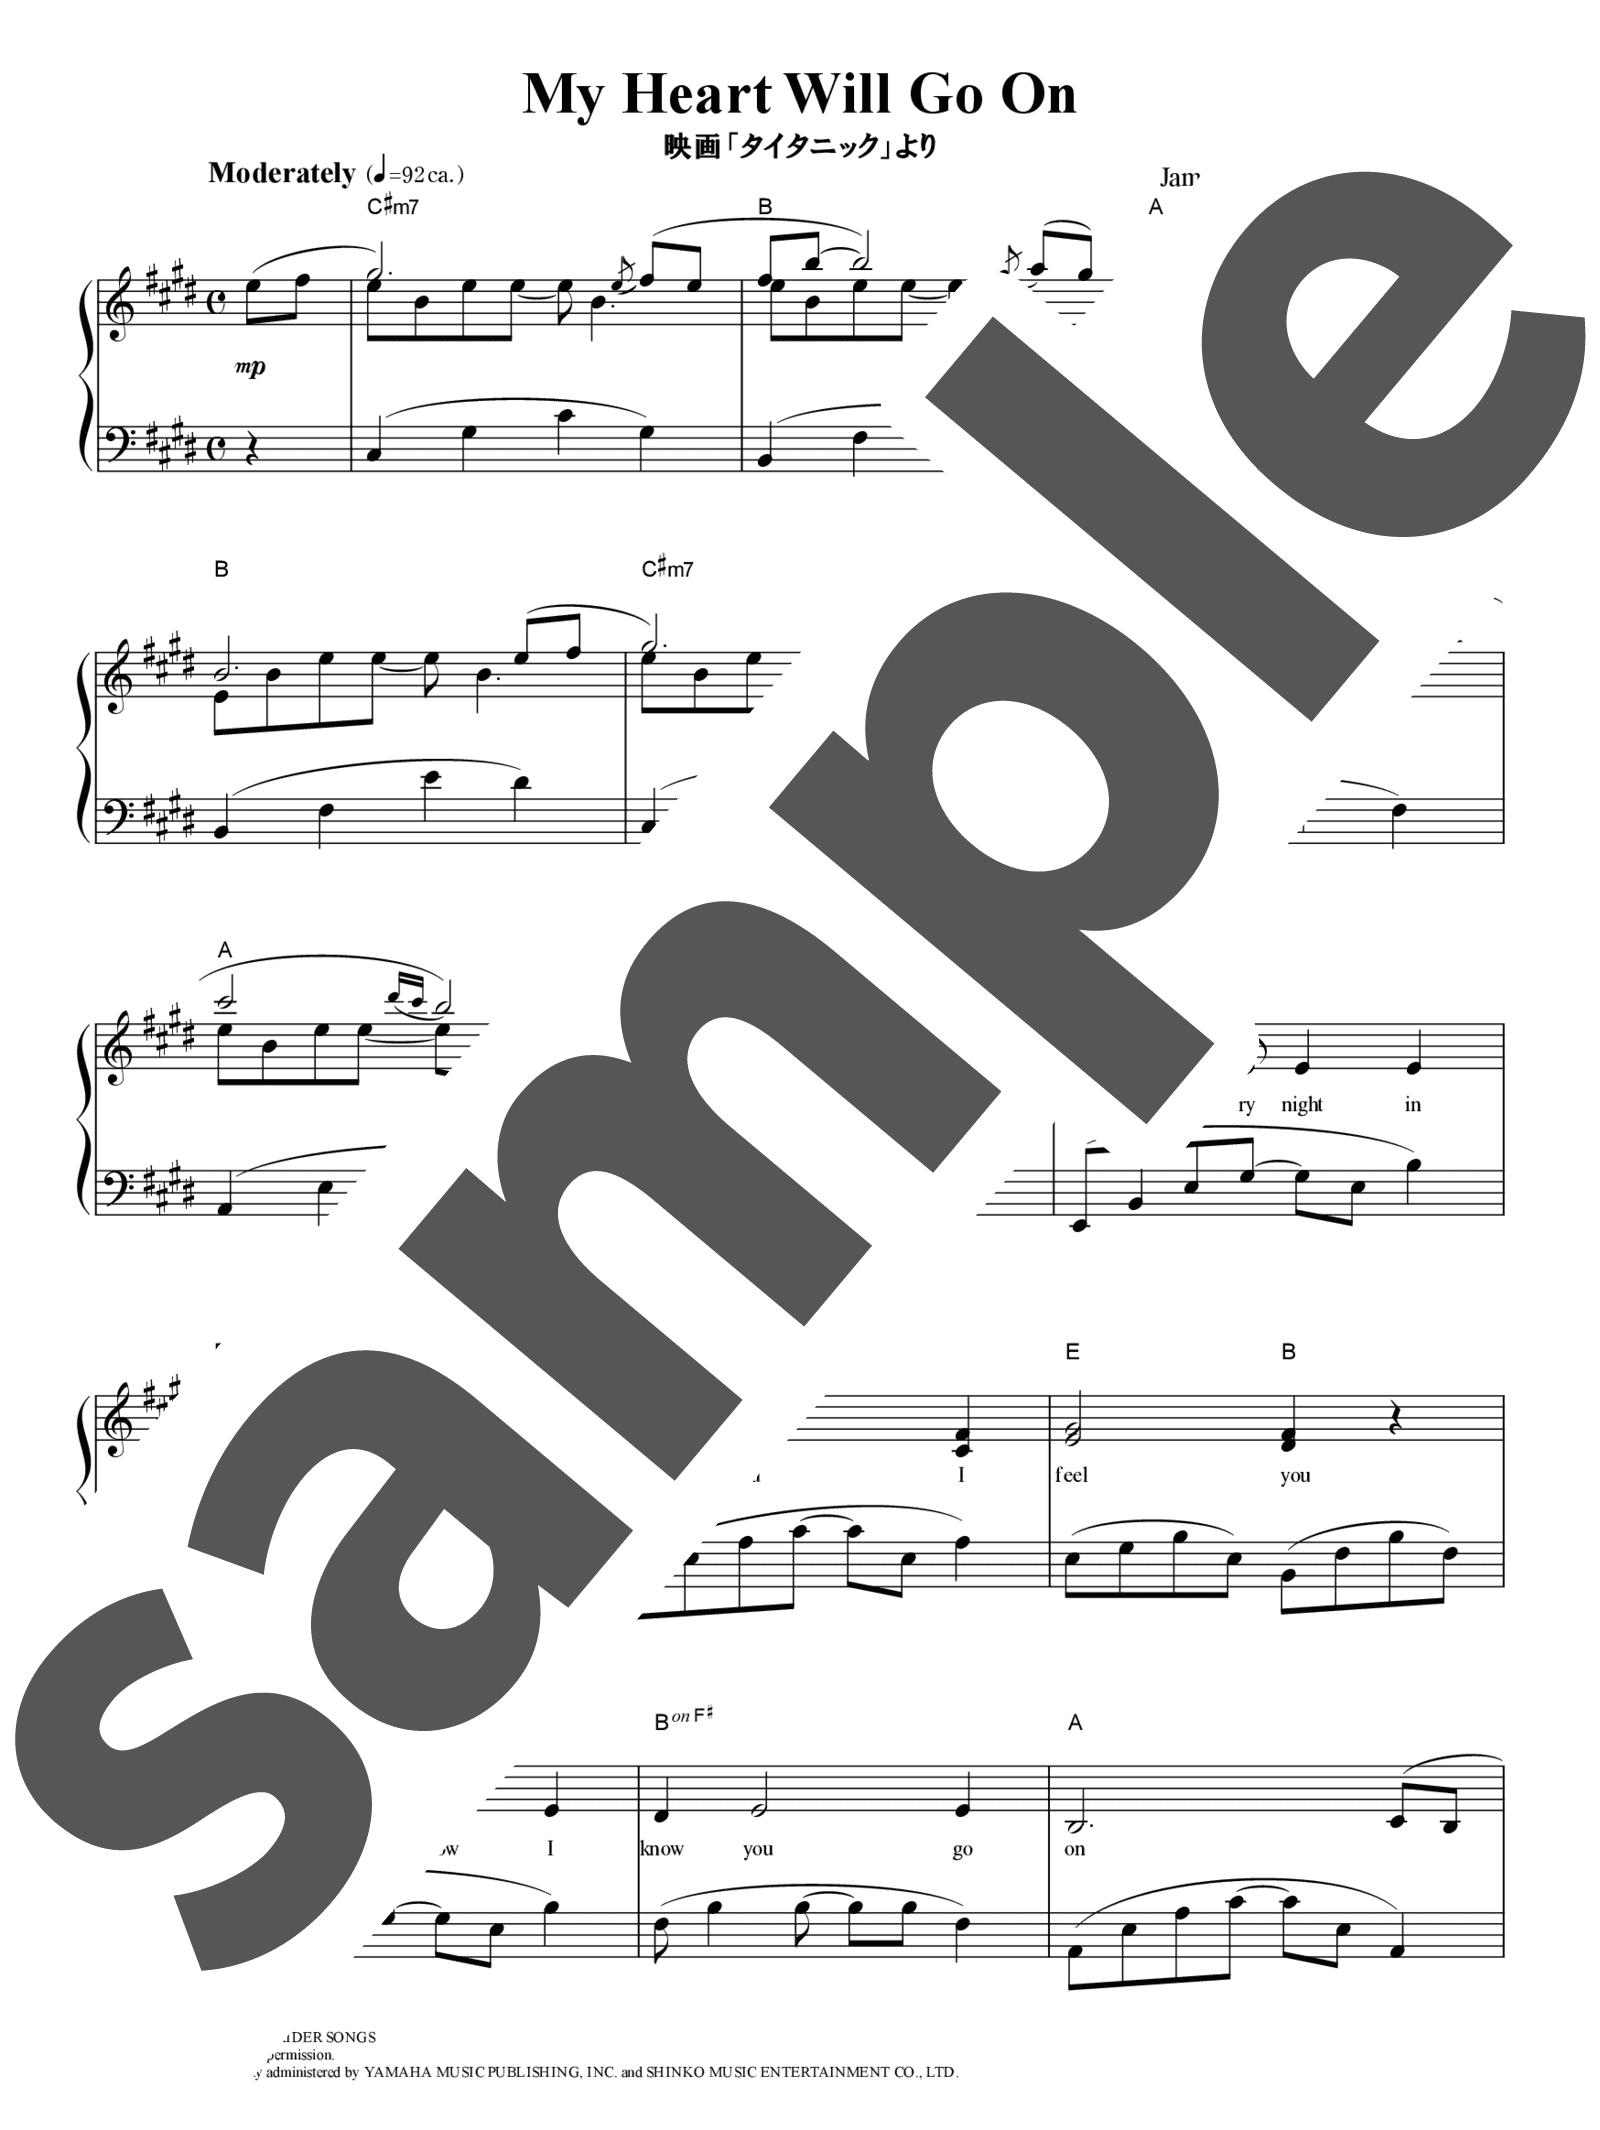 「My Heart Will Go On」のサンプル楽譜